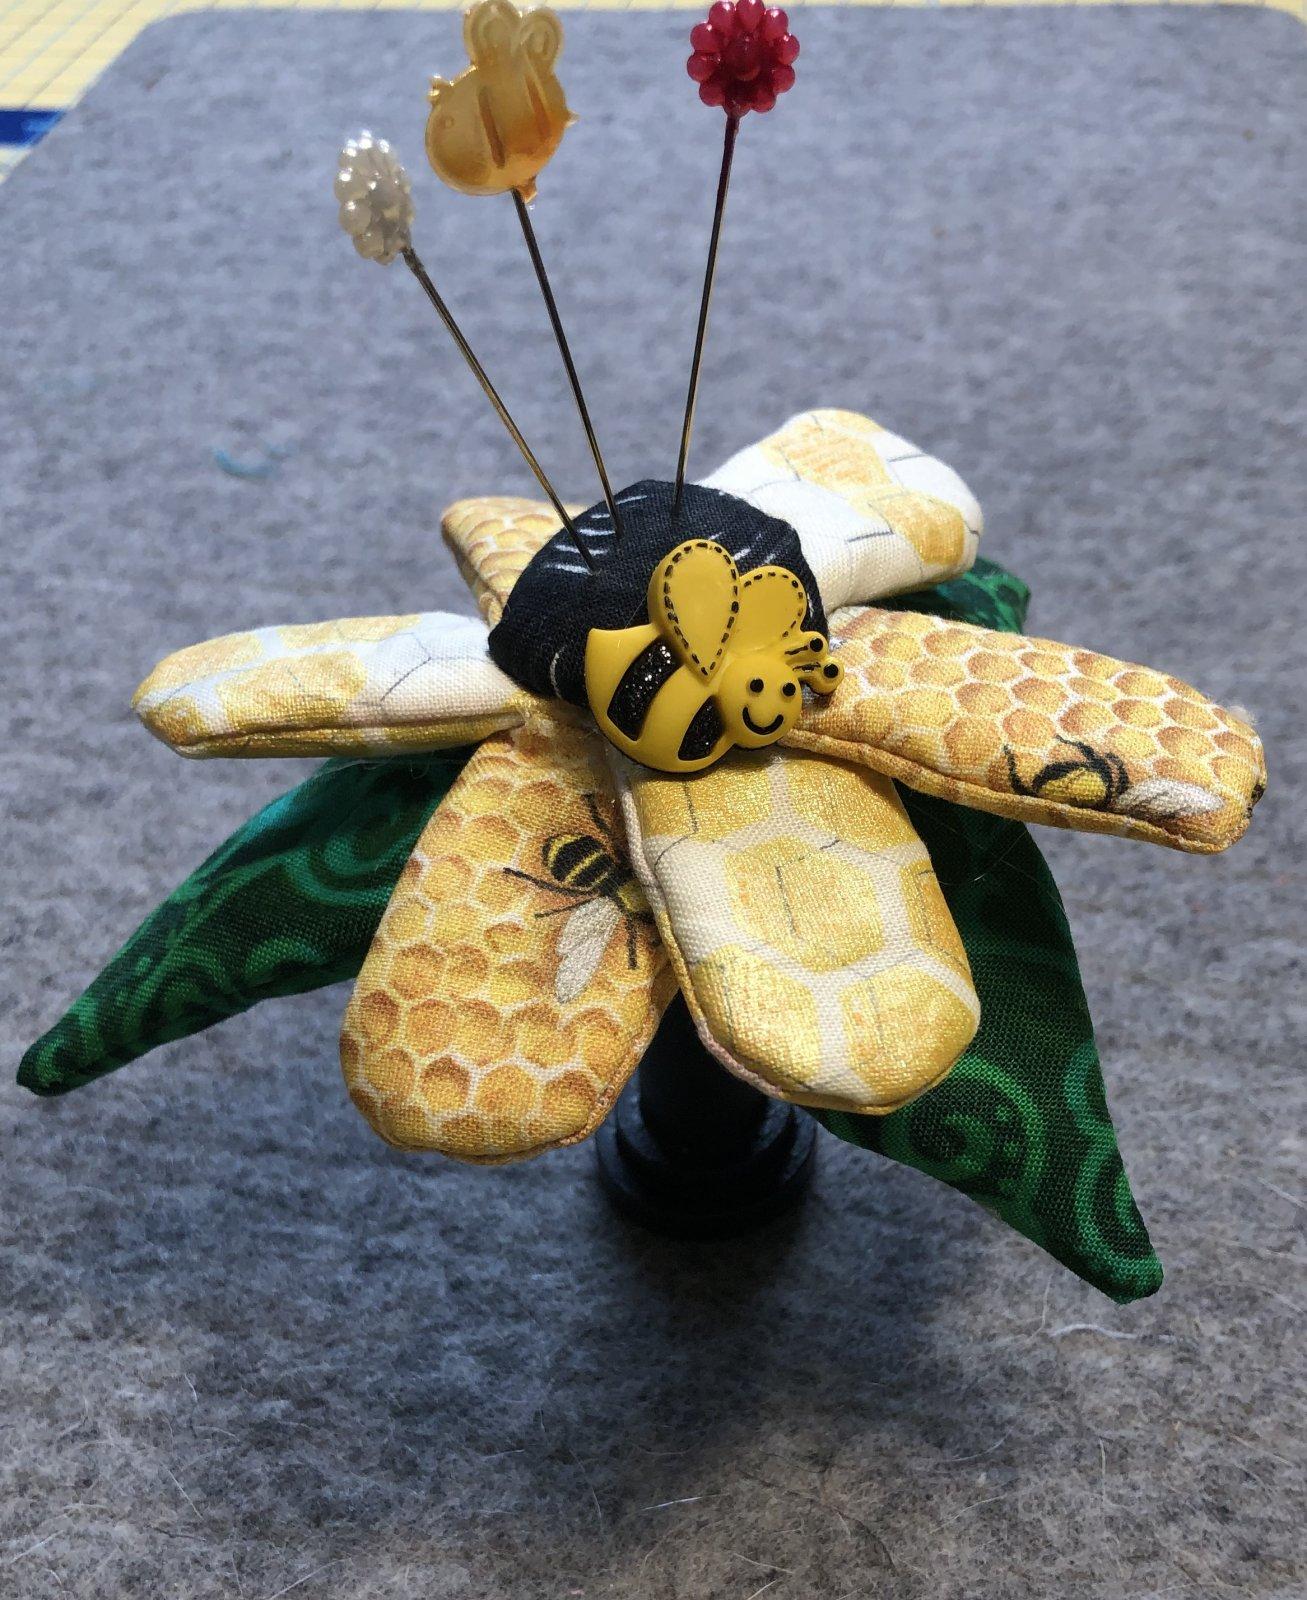 Flower Pincushion Kit w wooden spool - Bumblebee